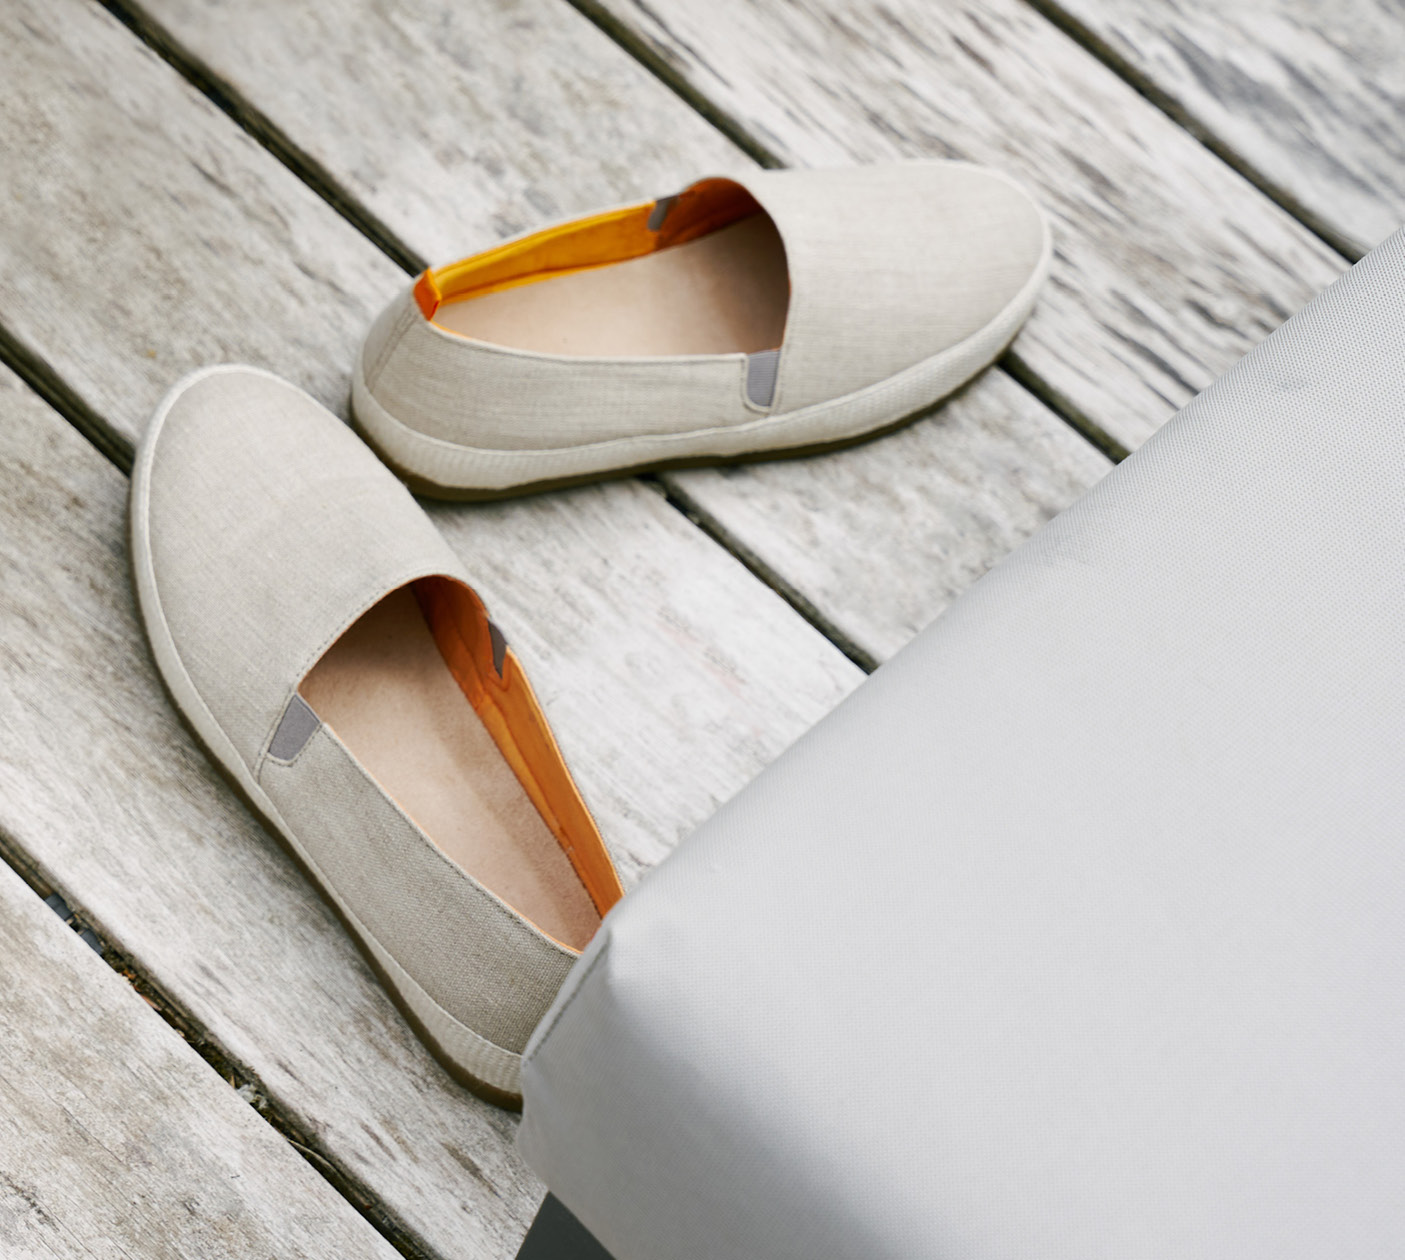 Poolside Style - New Beige Linen Espadrilles for Men